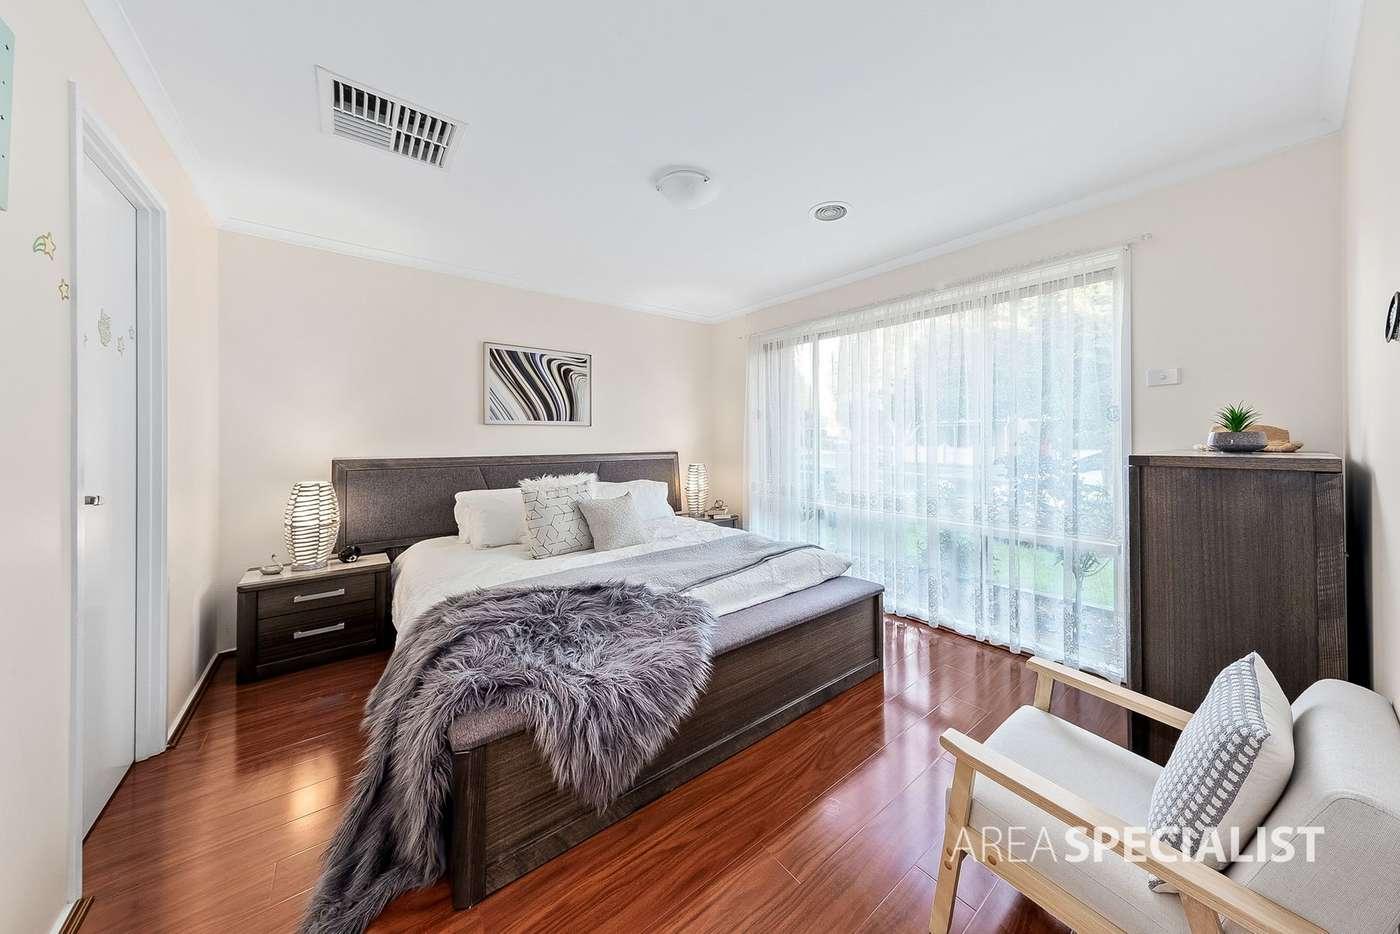 Sixth view of Homely house listing, 3 Moreton Close, Caroline Springs VIC 3023